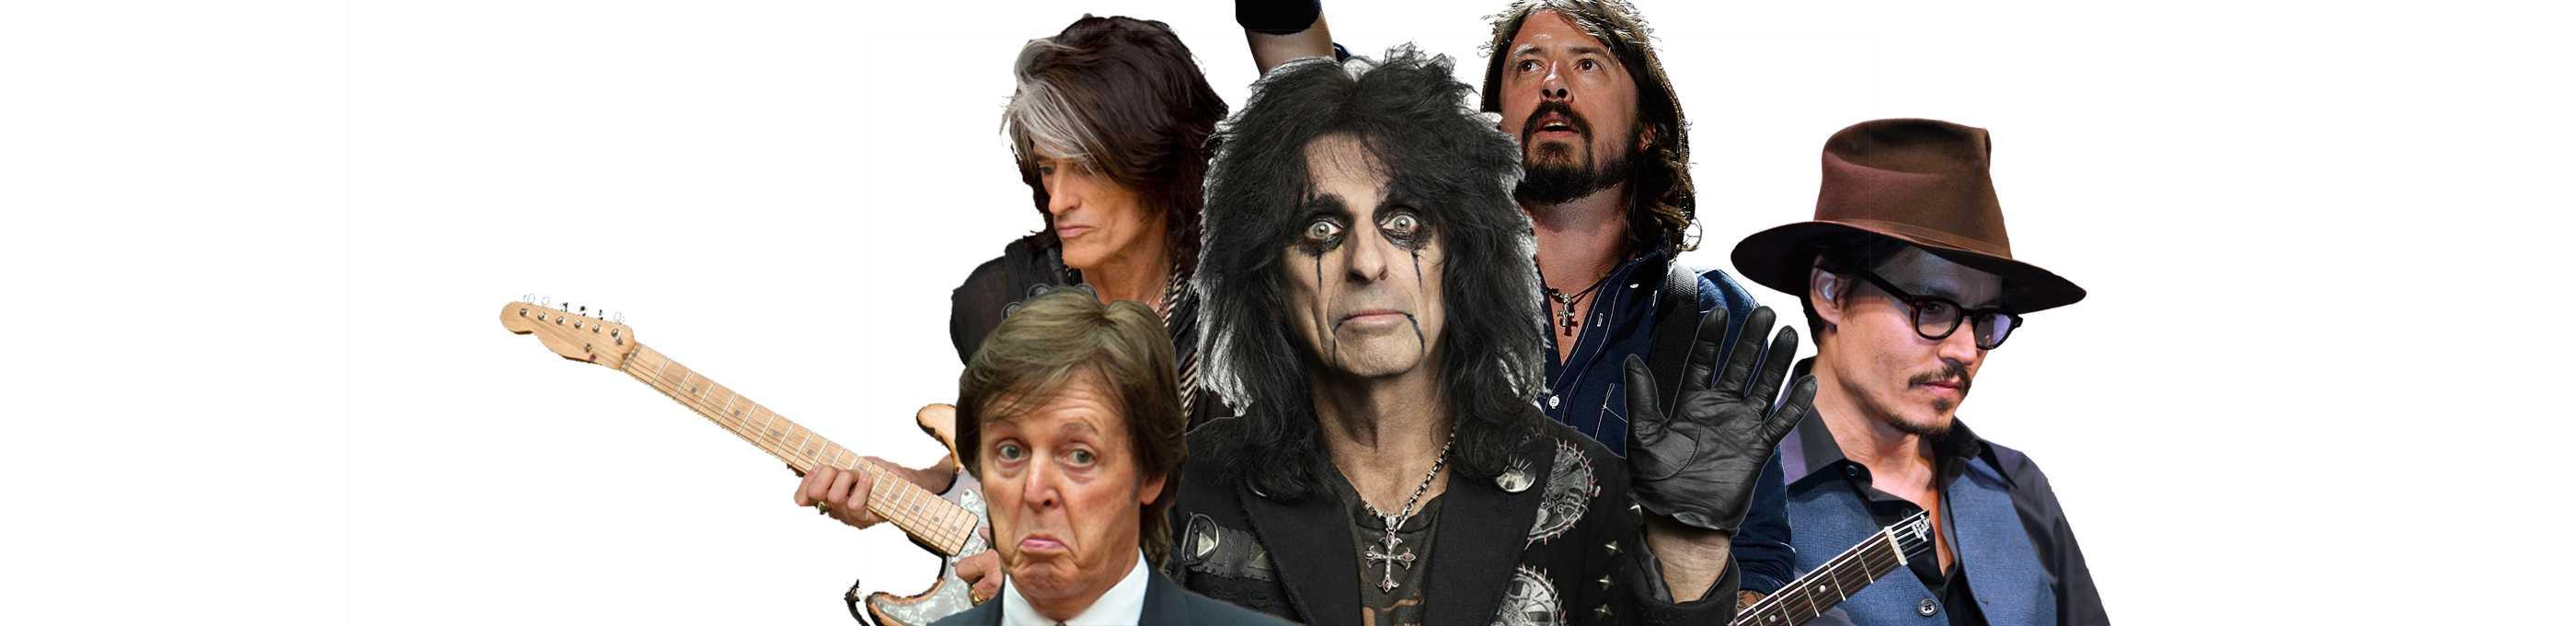 Rock Legends Live On: Hollywood Vampires New Album